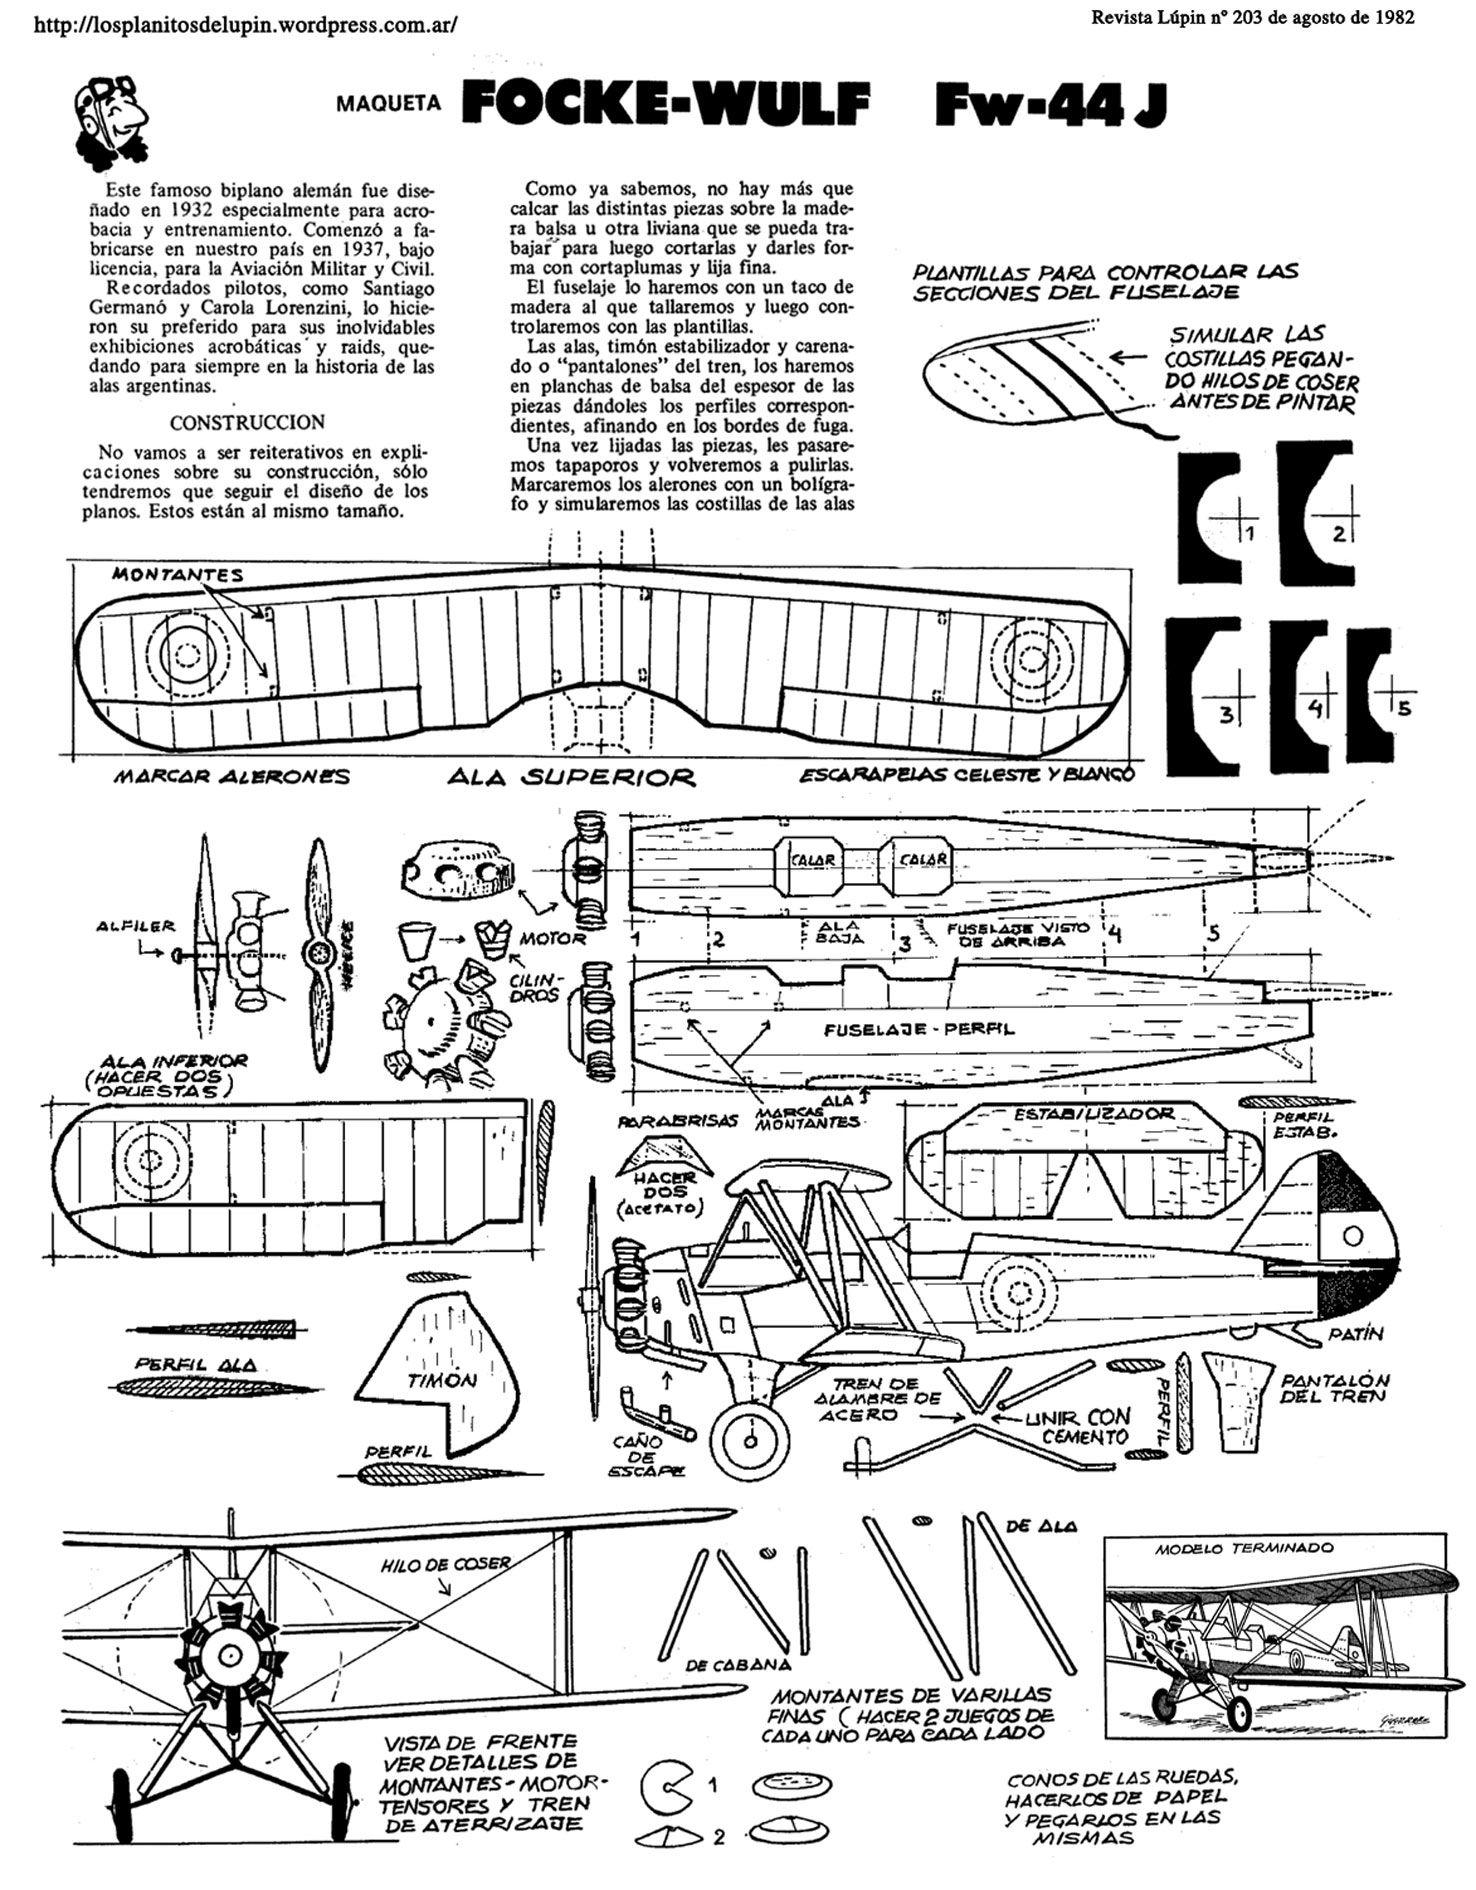 Planitos De Lupin Focke Wulf Fw 44